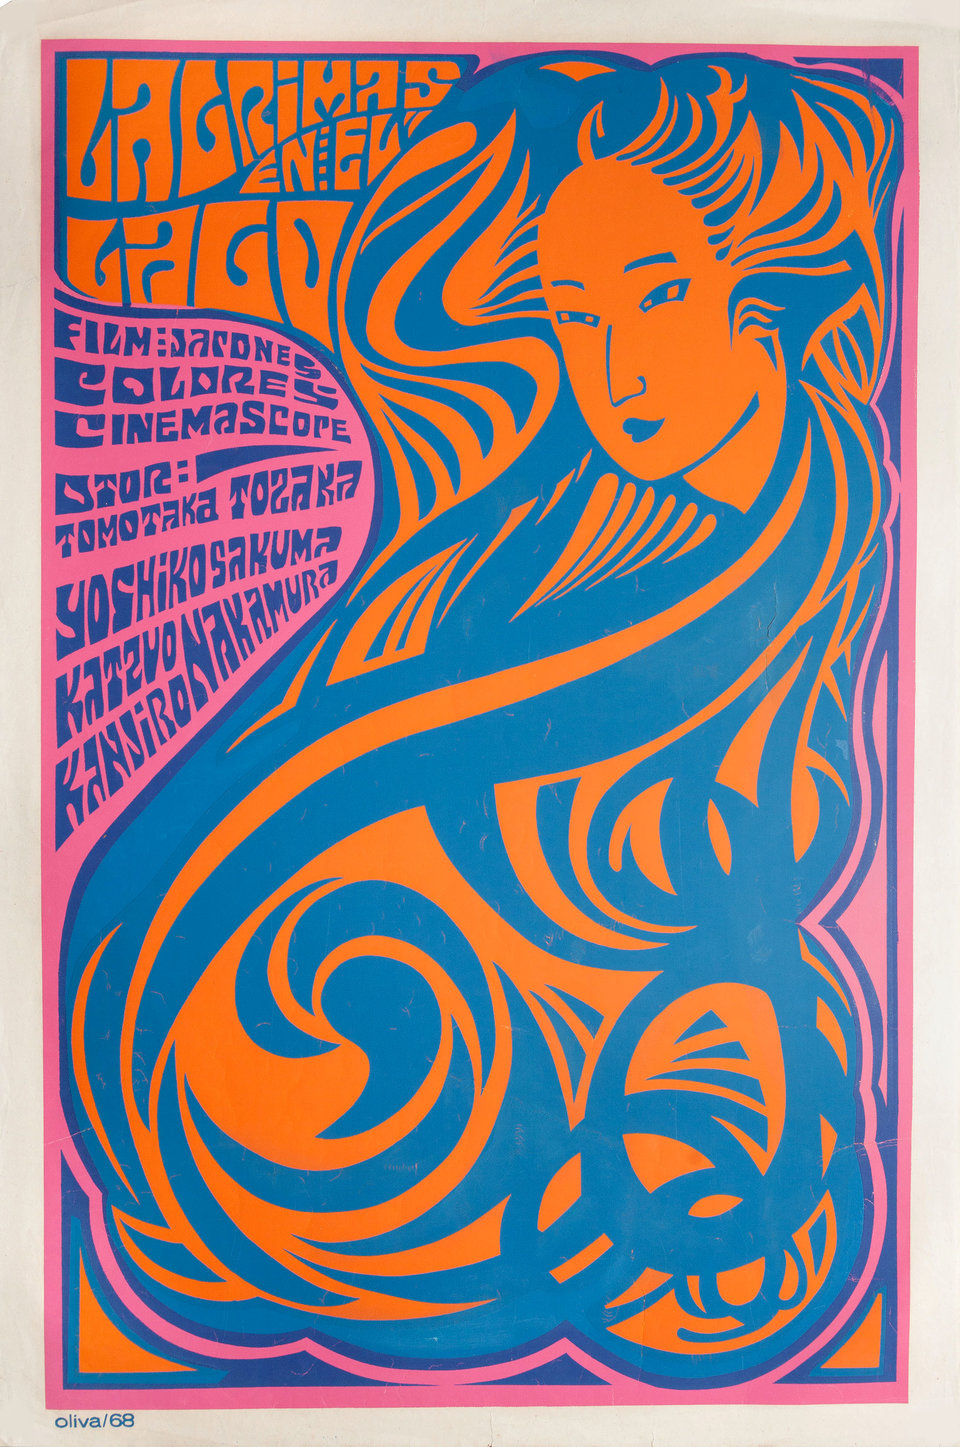 Lake of Tears 1968 Cuban Poster